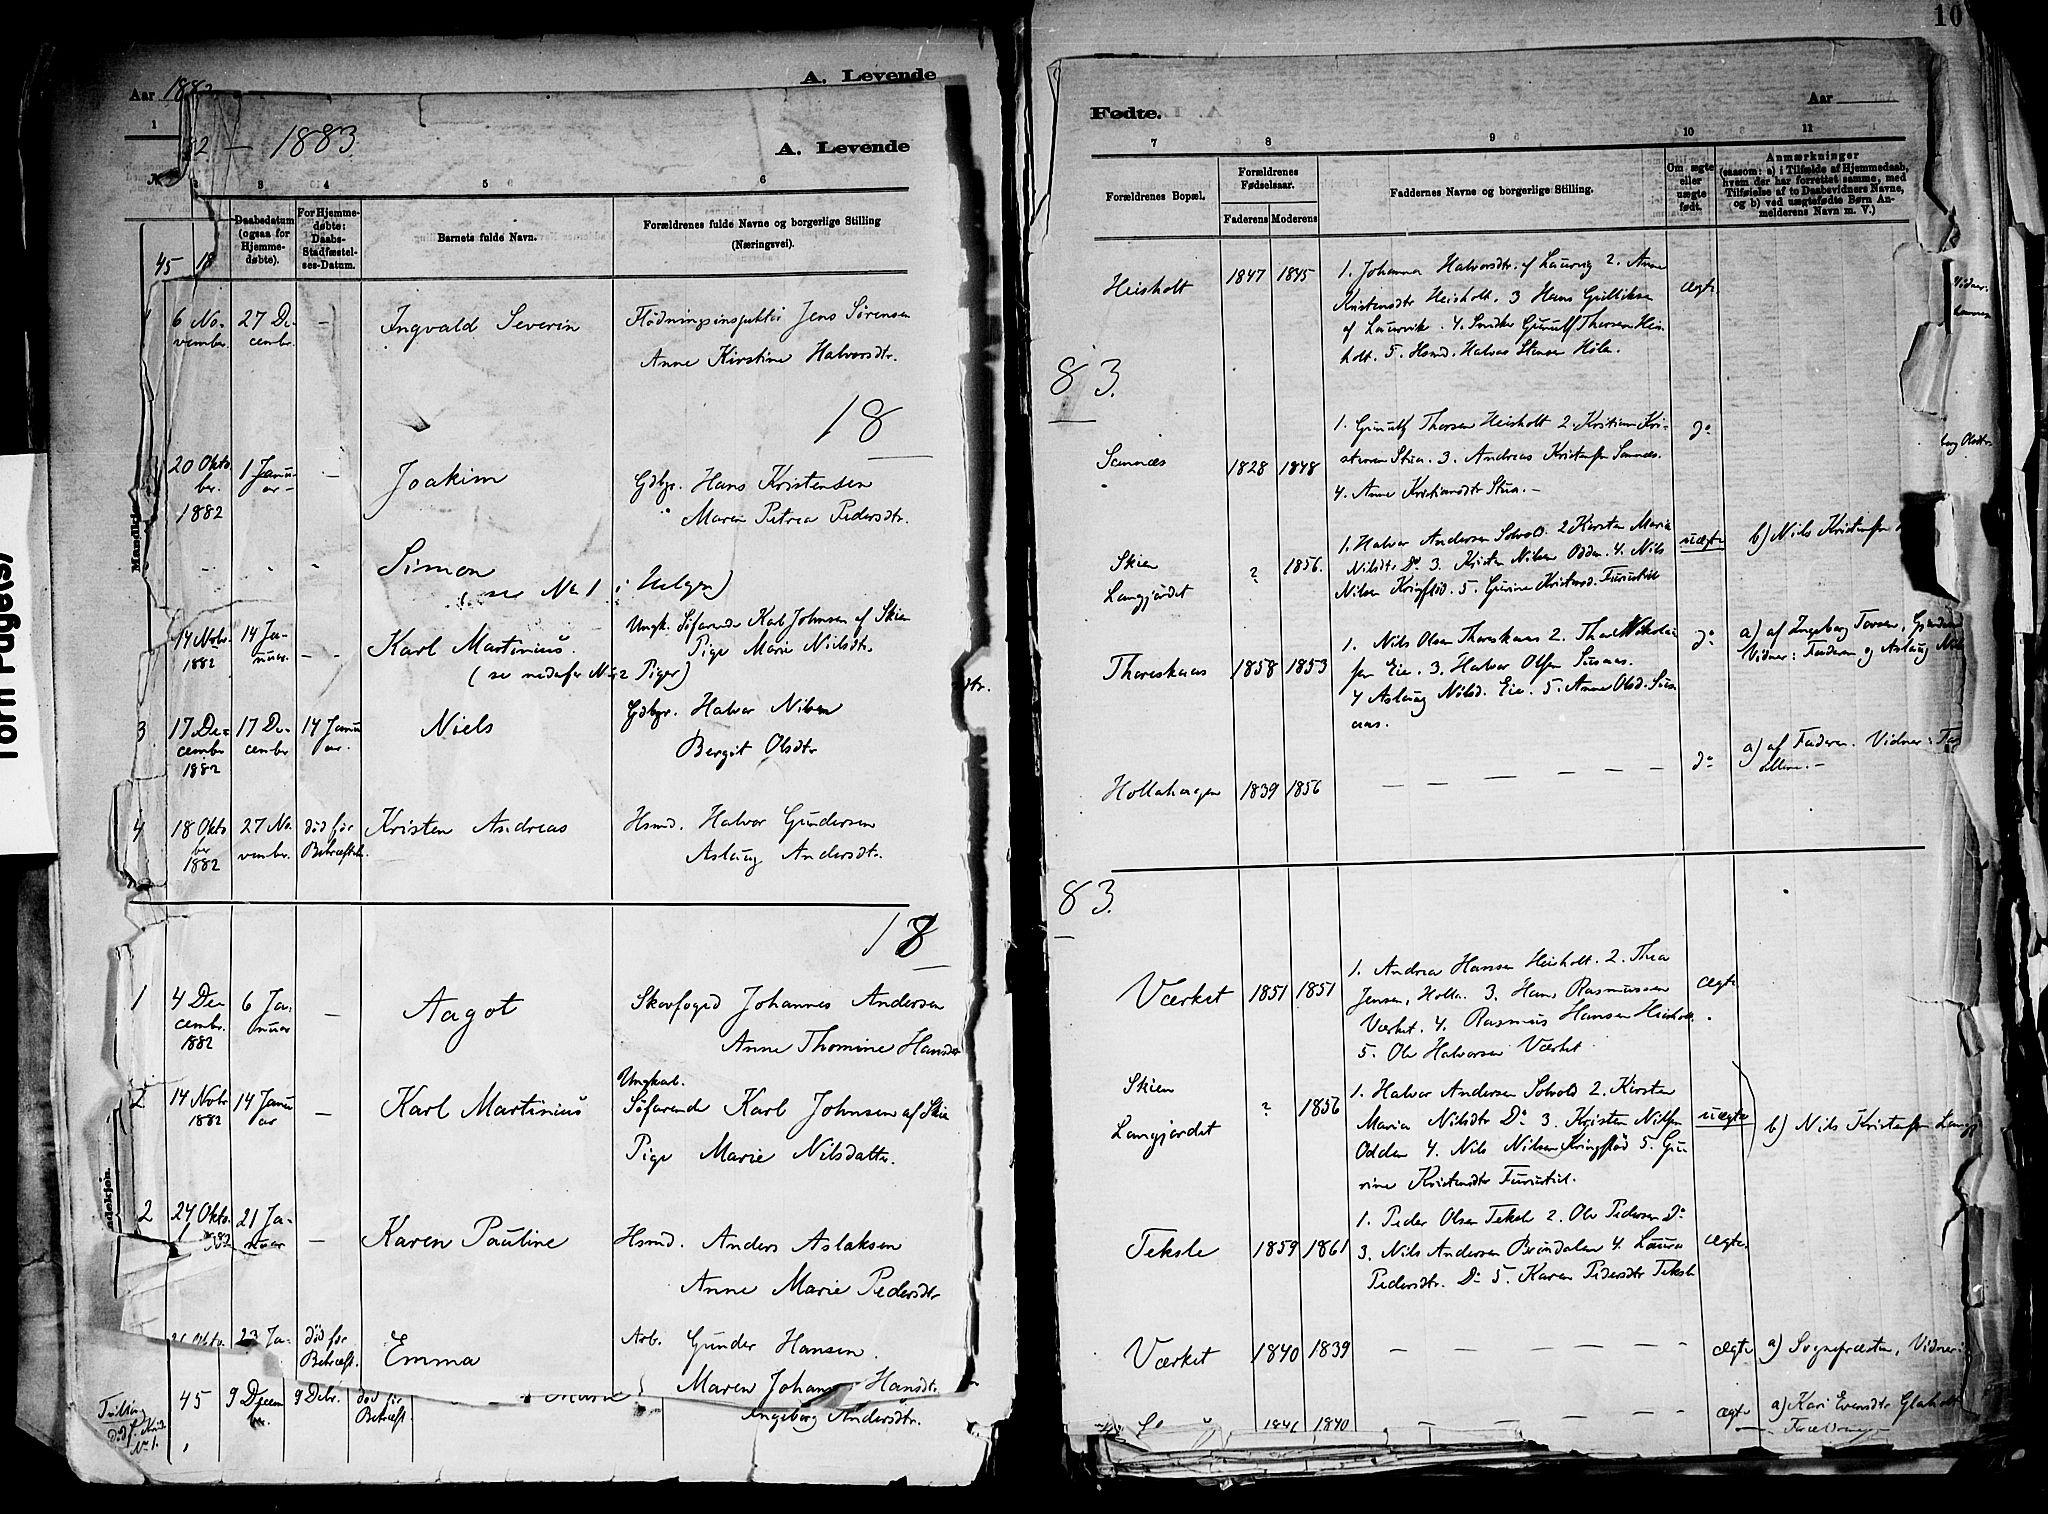 SAKO, Holla kirkebøker, F/Fa/L0008: Ministerialbok nr. 8, 1882-1897, s. 9